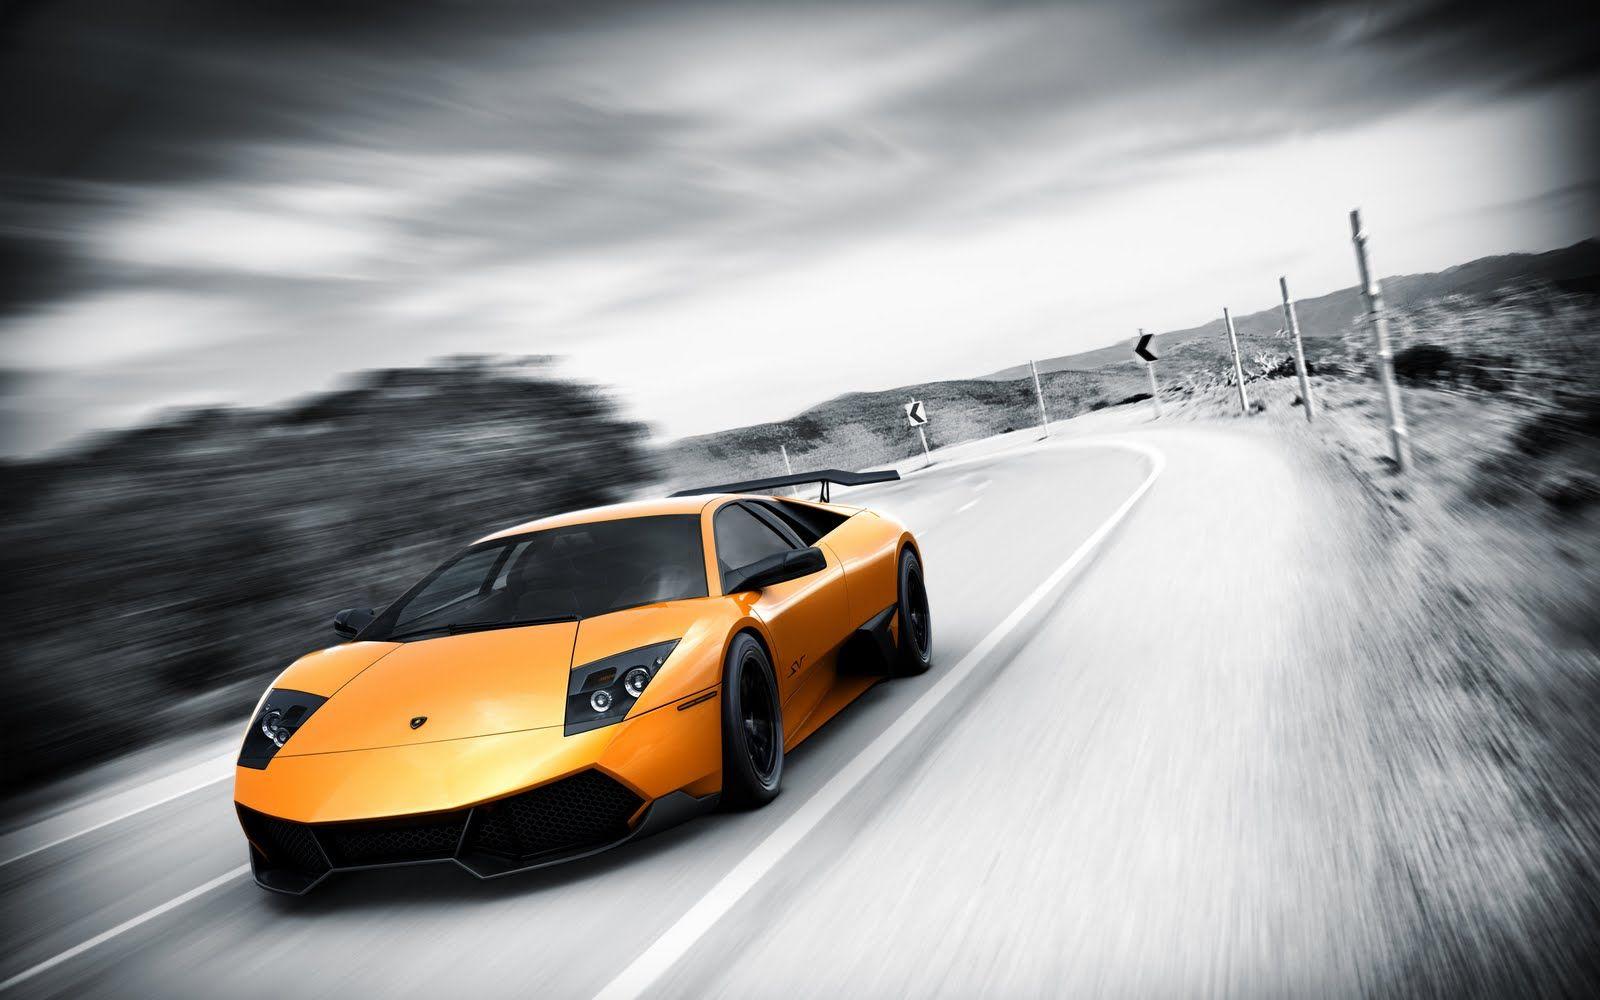 Lamborghini Cars Wallpapers Free Download Hd Latest Motors Images X Hd Wallpaper Car  Wallpapers Adorable Wallpapers